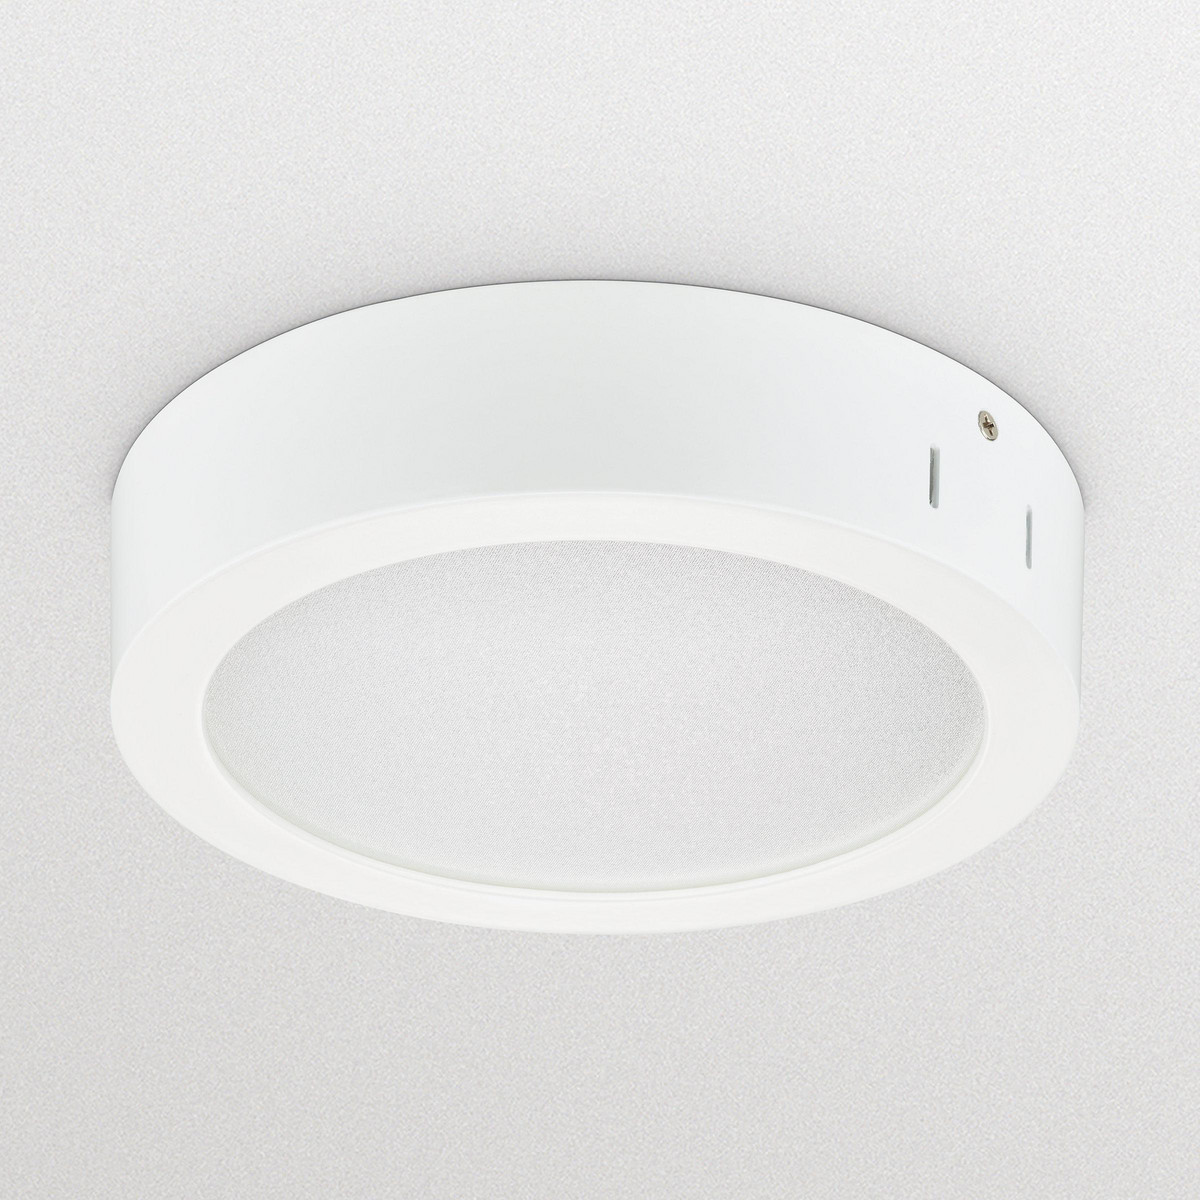 Philips CoreLine SlimDownlight Gen3 Påbyg DN145C LED 2100lm/830 Hvid